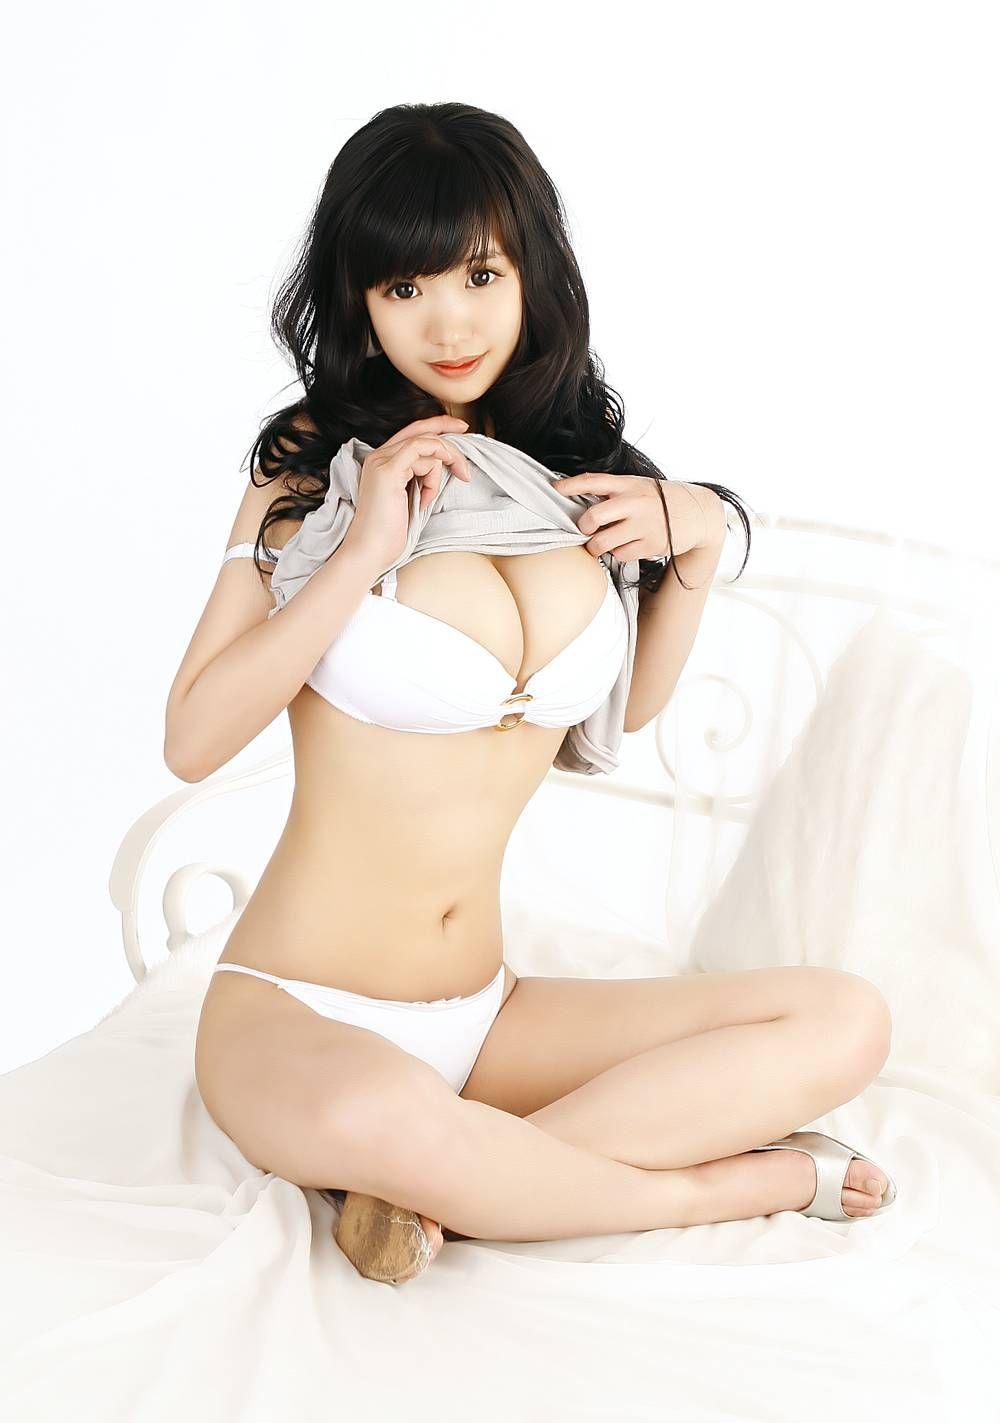 Hot sweet asian